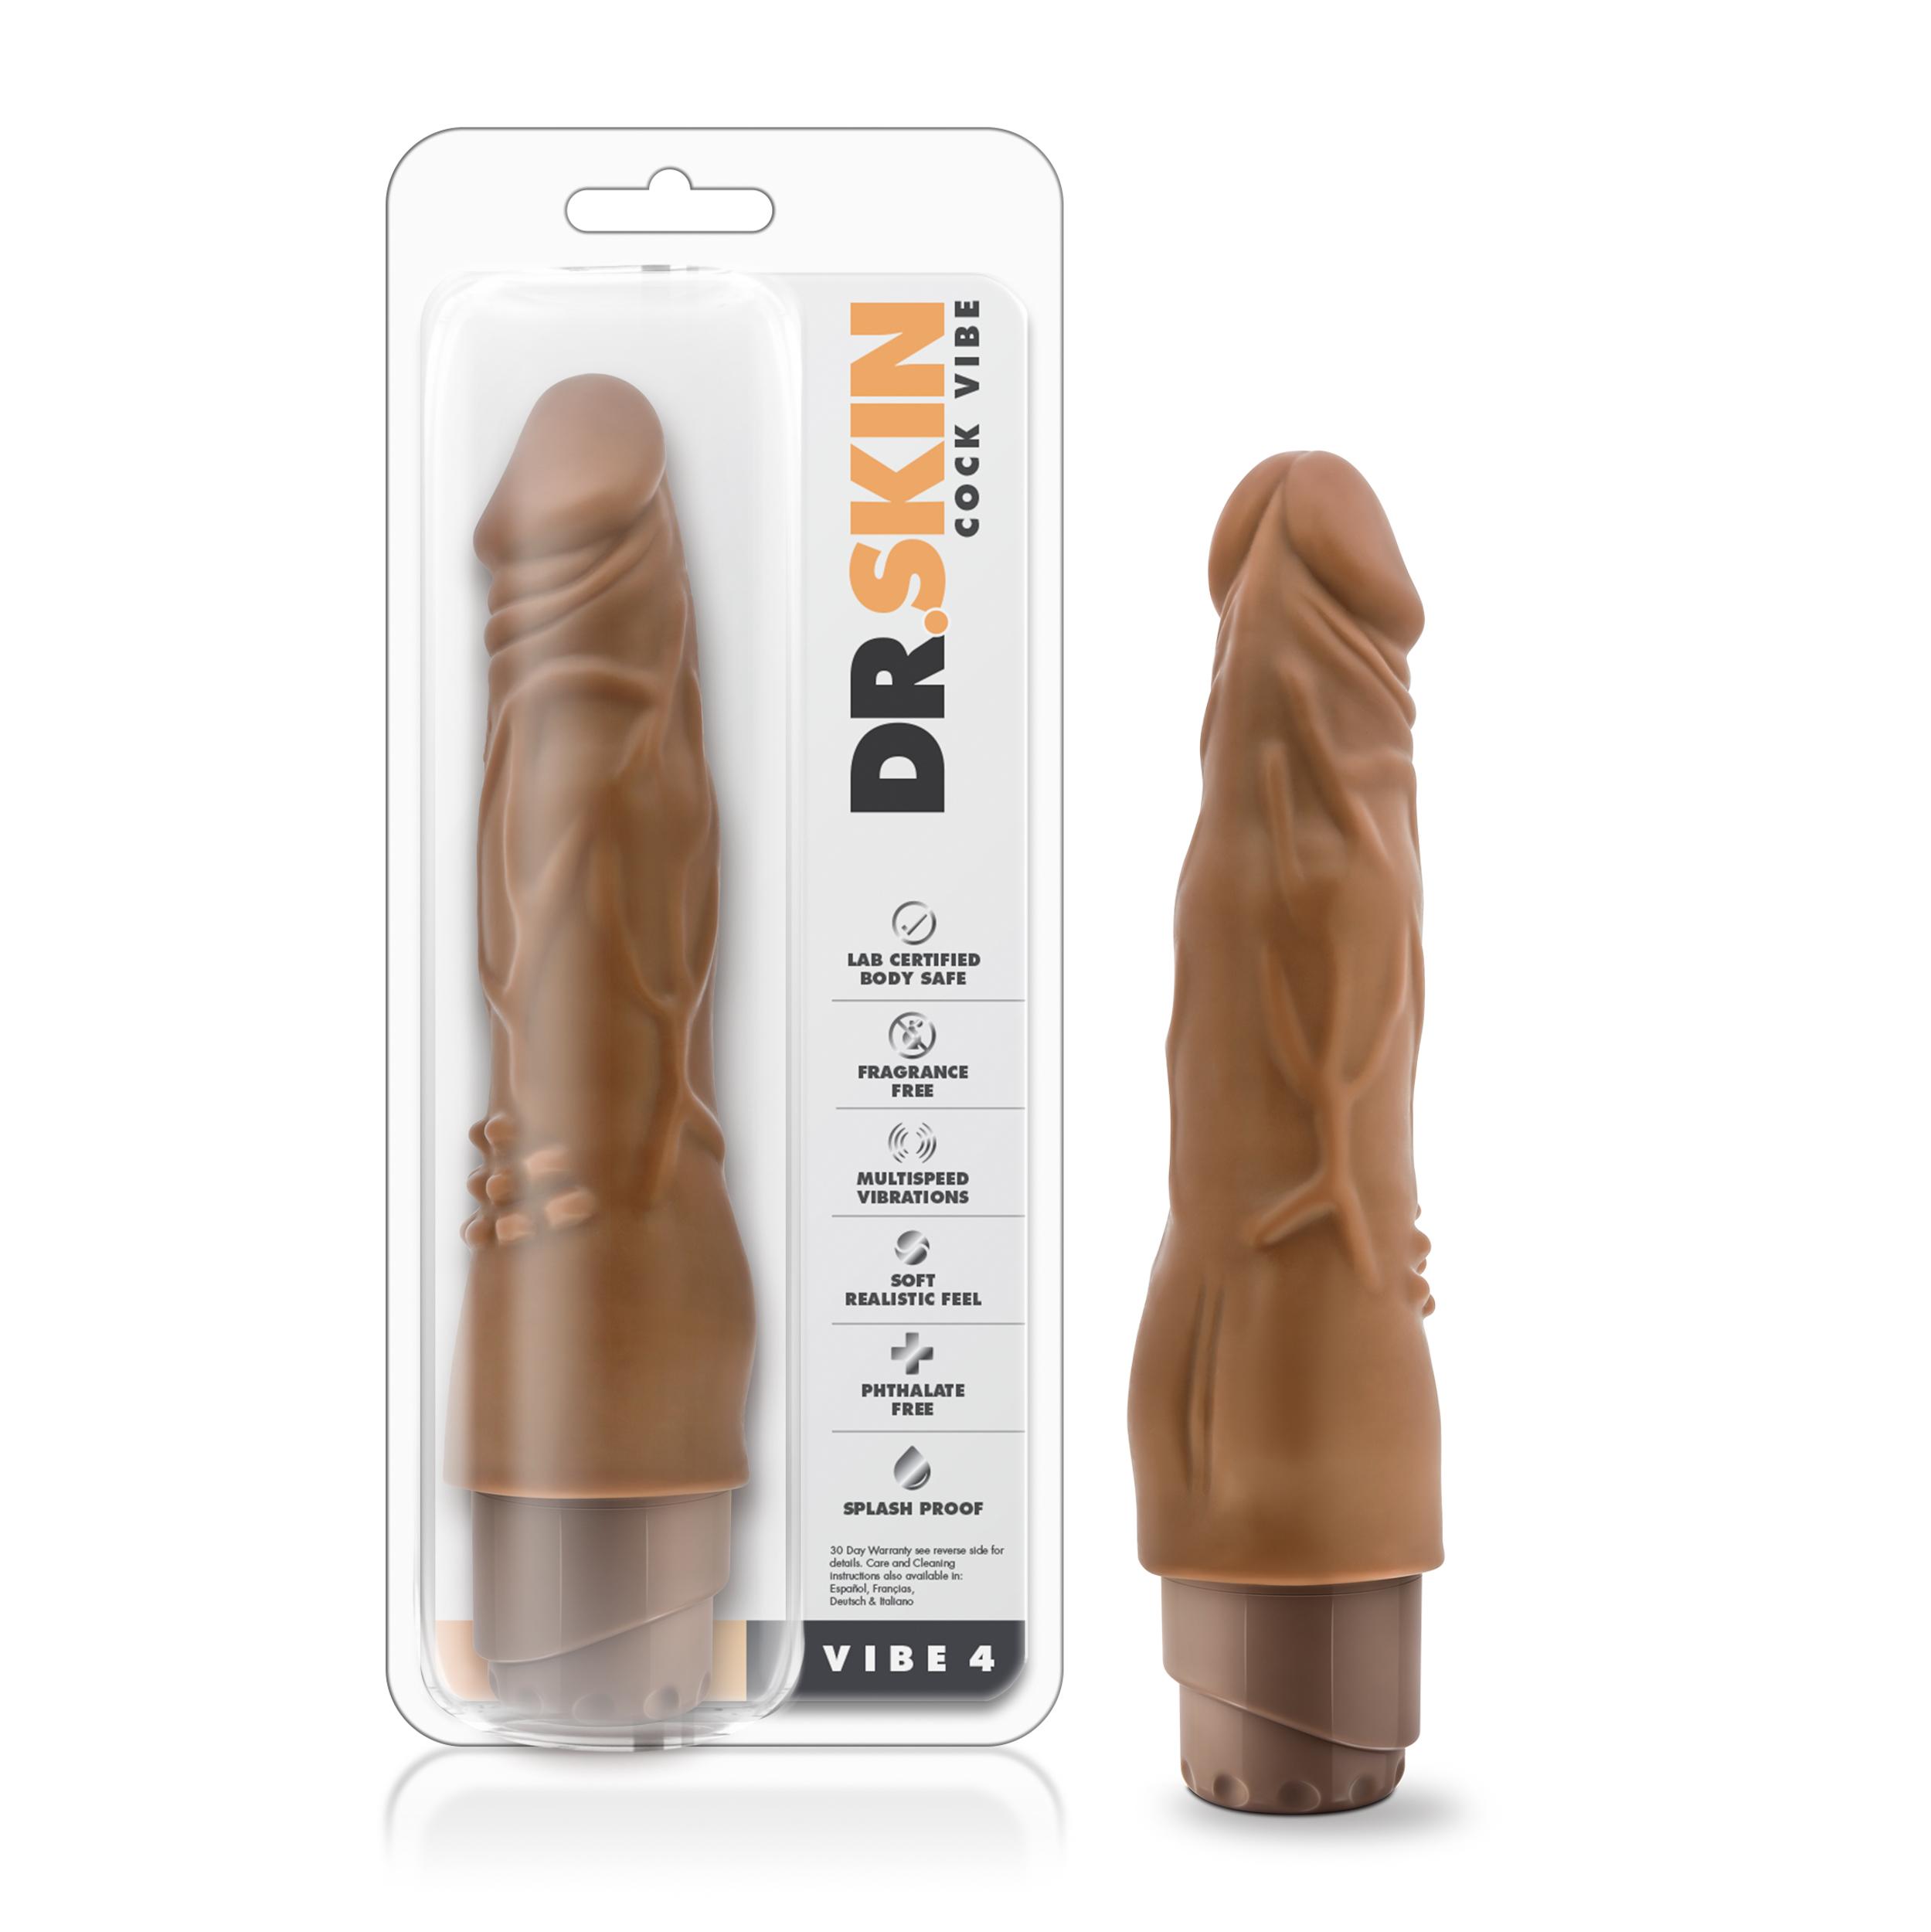 Dr. Skin - Cock Vibe 4 - 8 Inch Vibrating Cock - Mocha